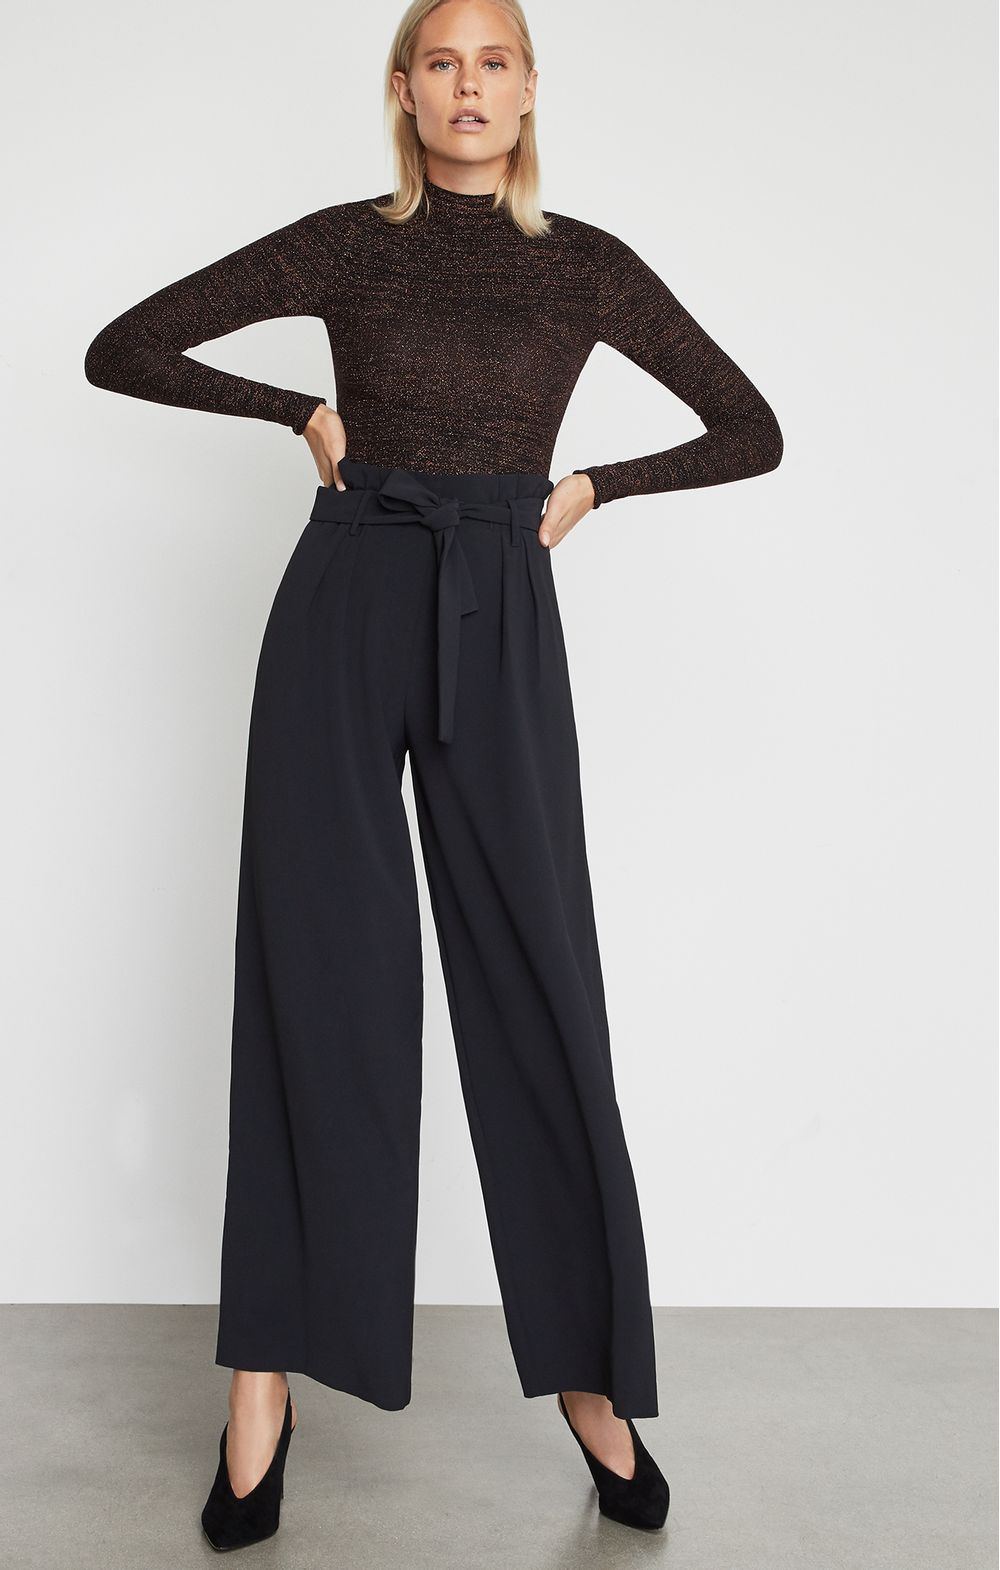 Pantalon-De-Pierna-Ancha-Plisada-COY2H332_001